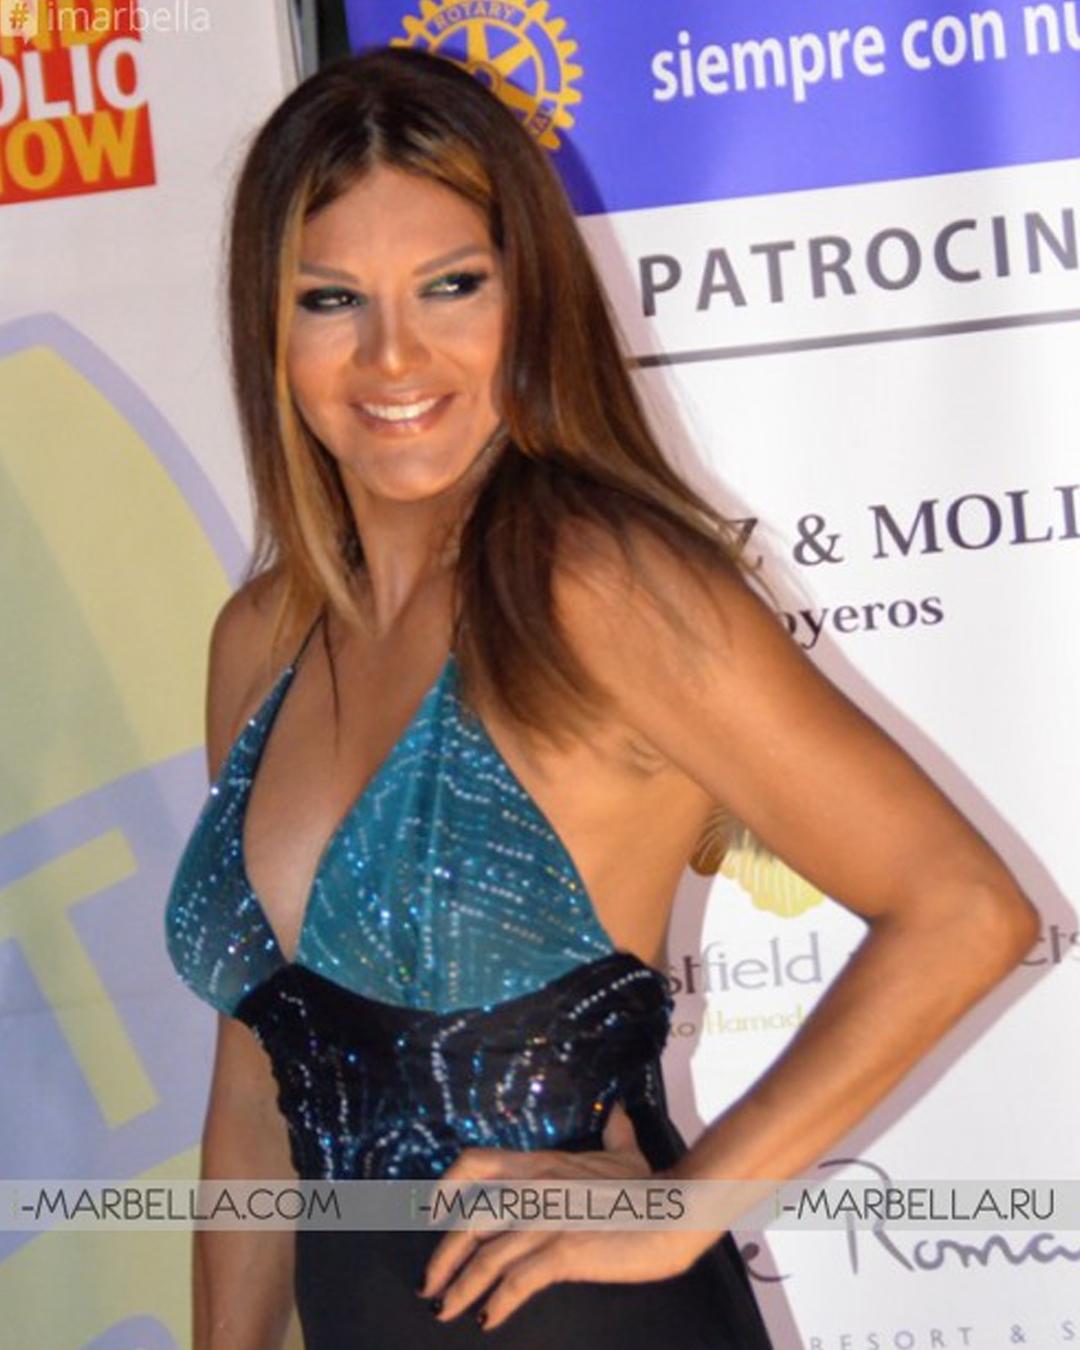 Ivonne Reyes asiste a Gala Benéfica del Rotary Club Marbella